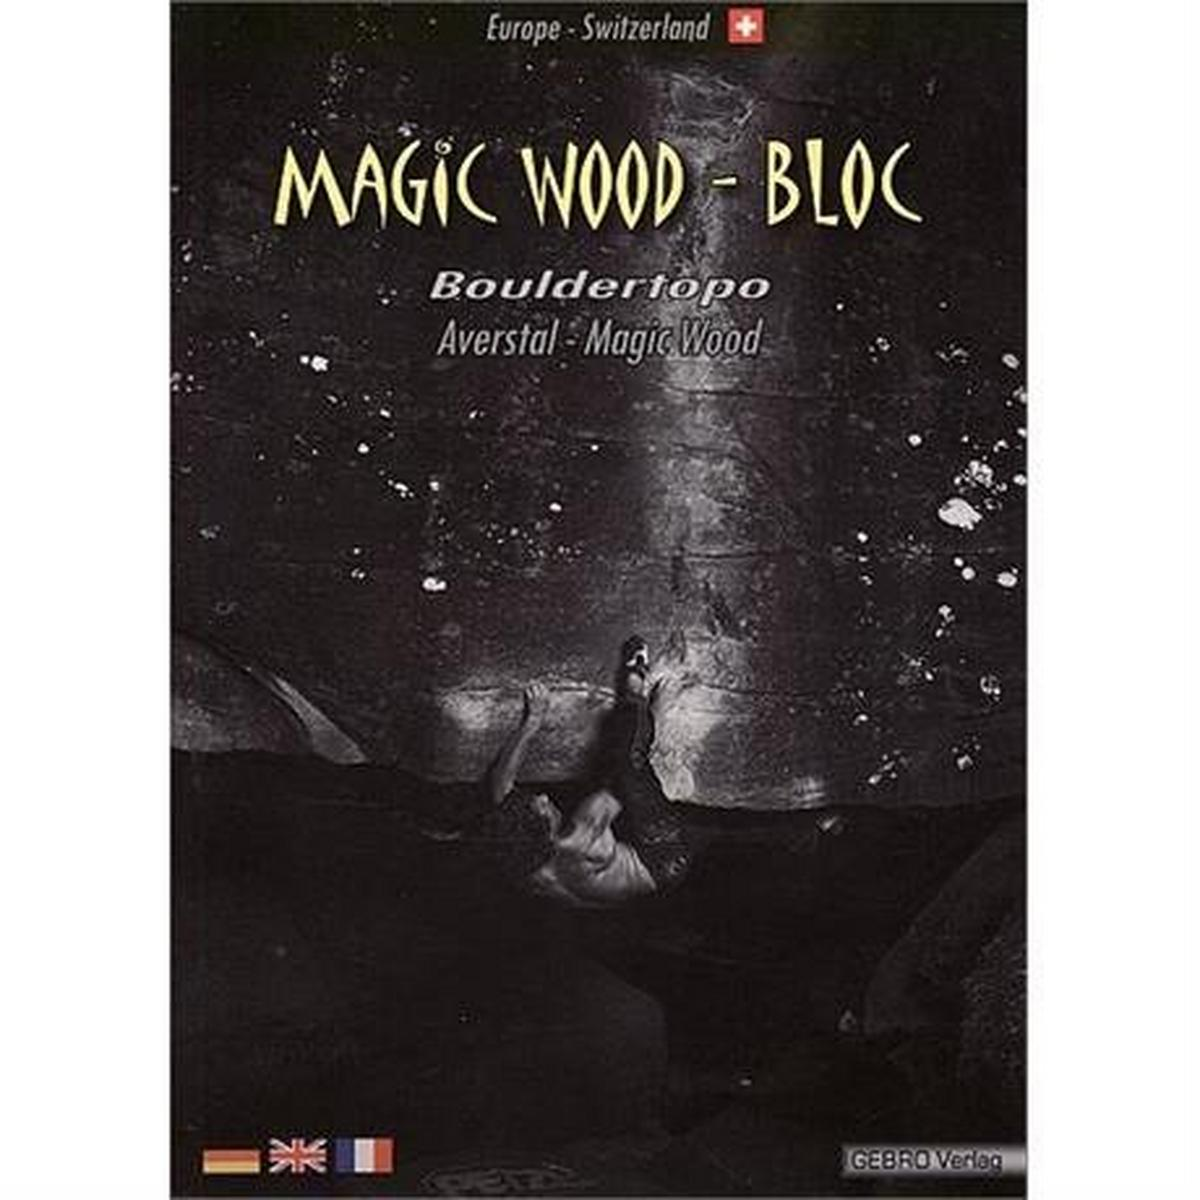 Miscellaneous Climbing Guide Book: Magic Wood Bloc - Bouldertopo